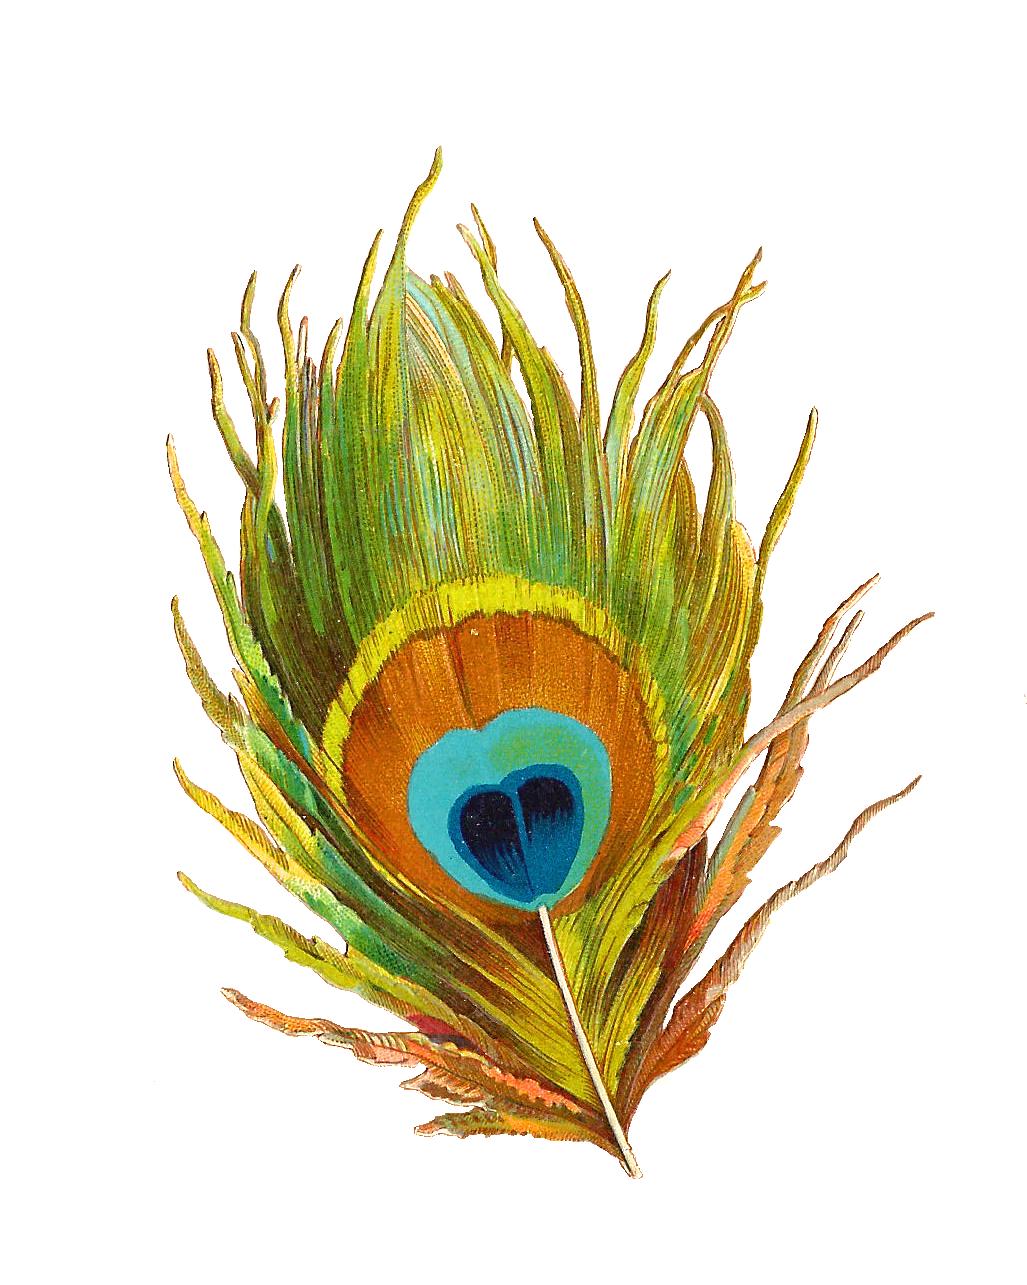 1027x1285 Peacock Feather Clip Art. Clipart Panda